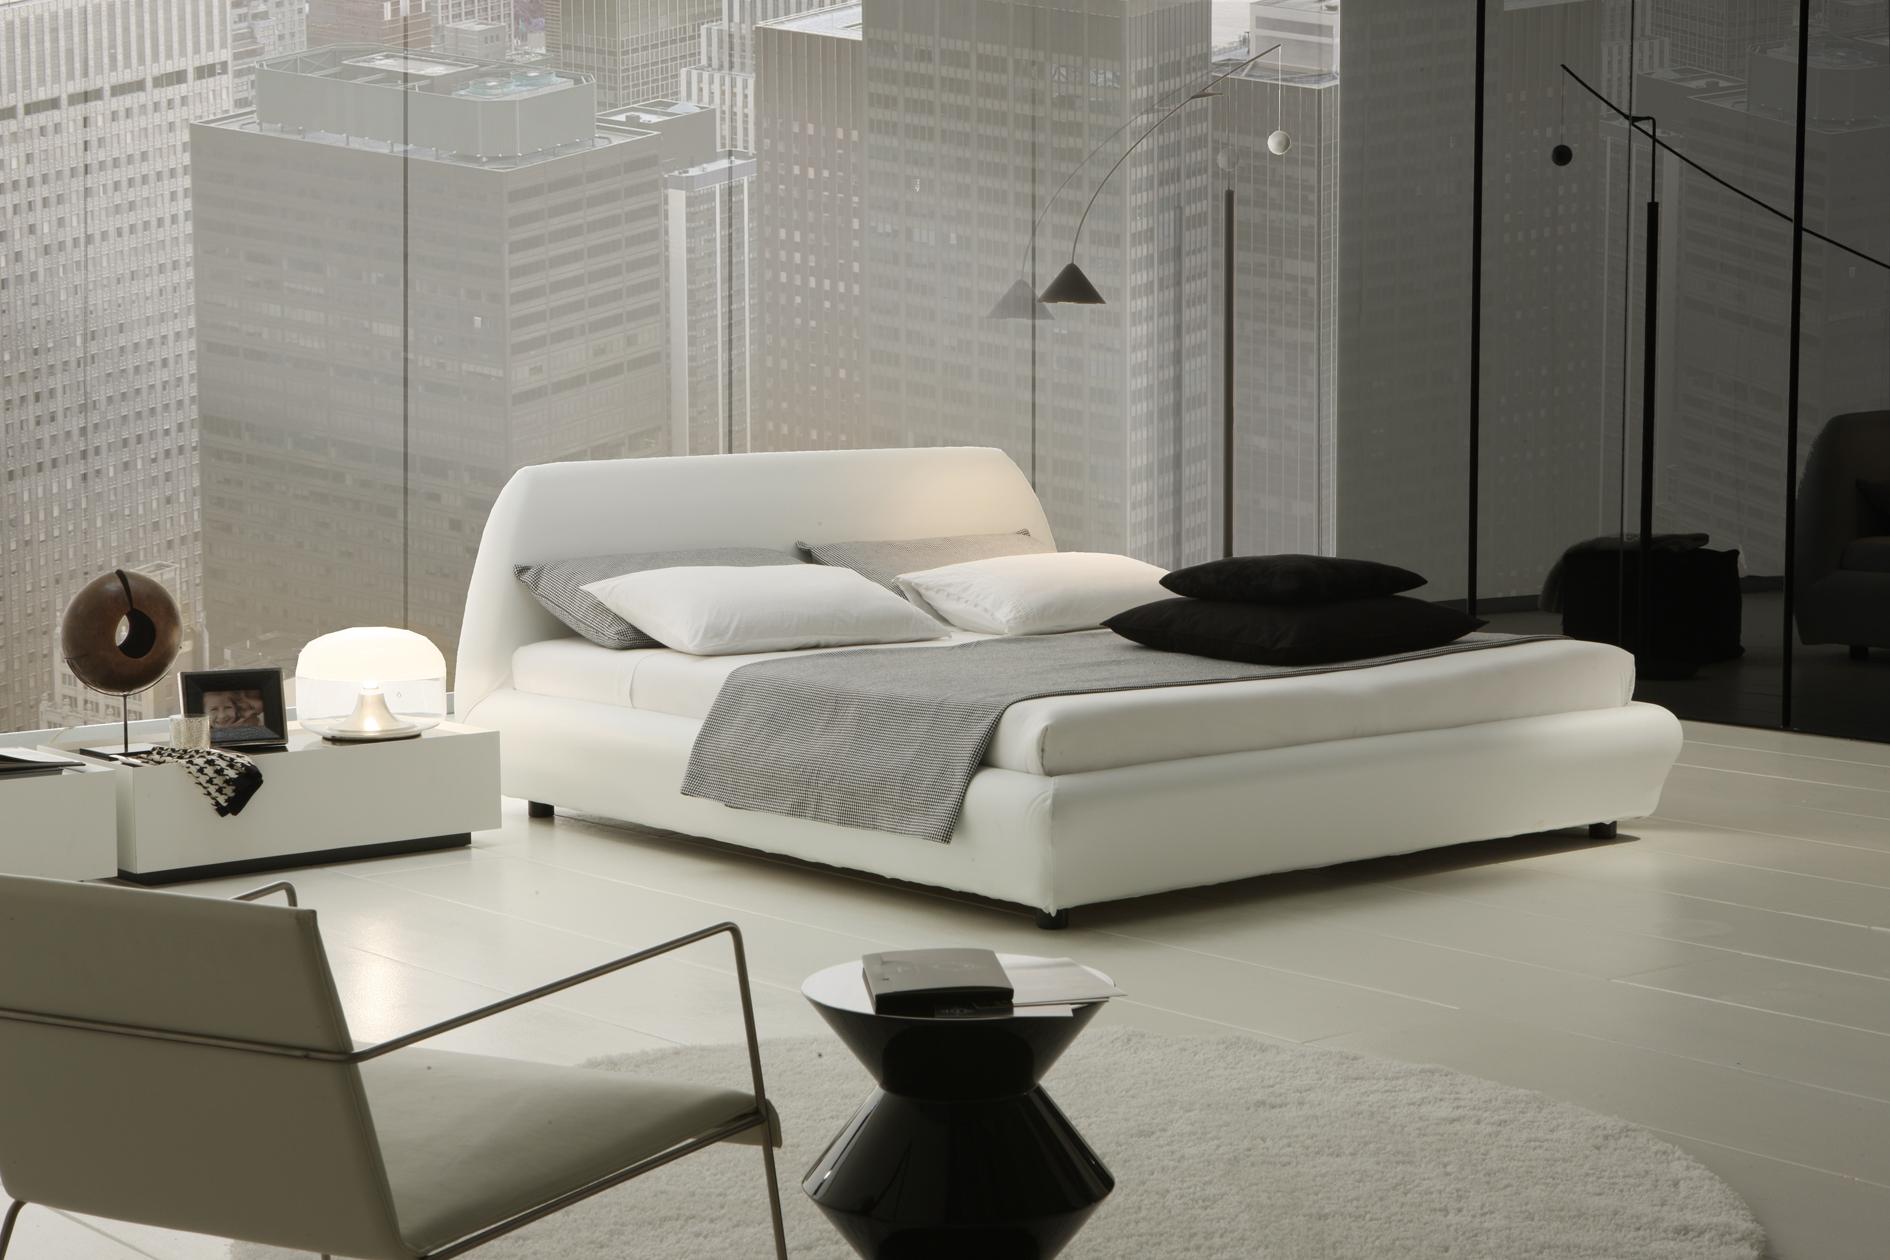 habitacion minimalista 2